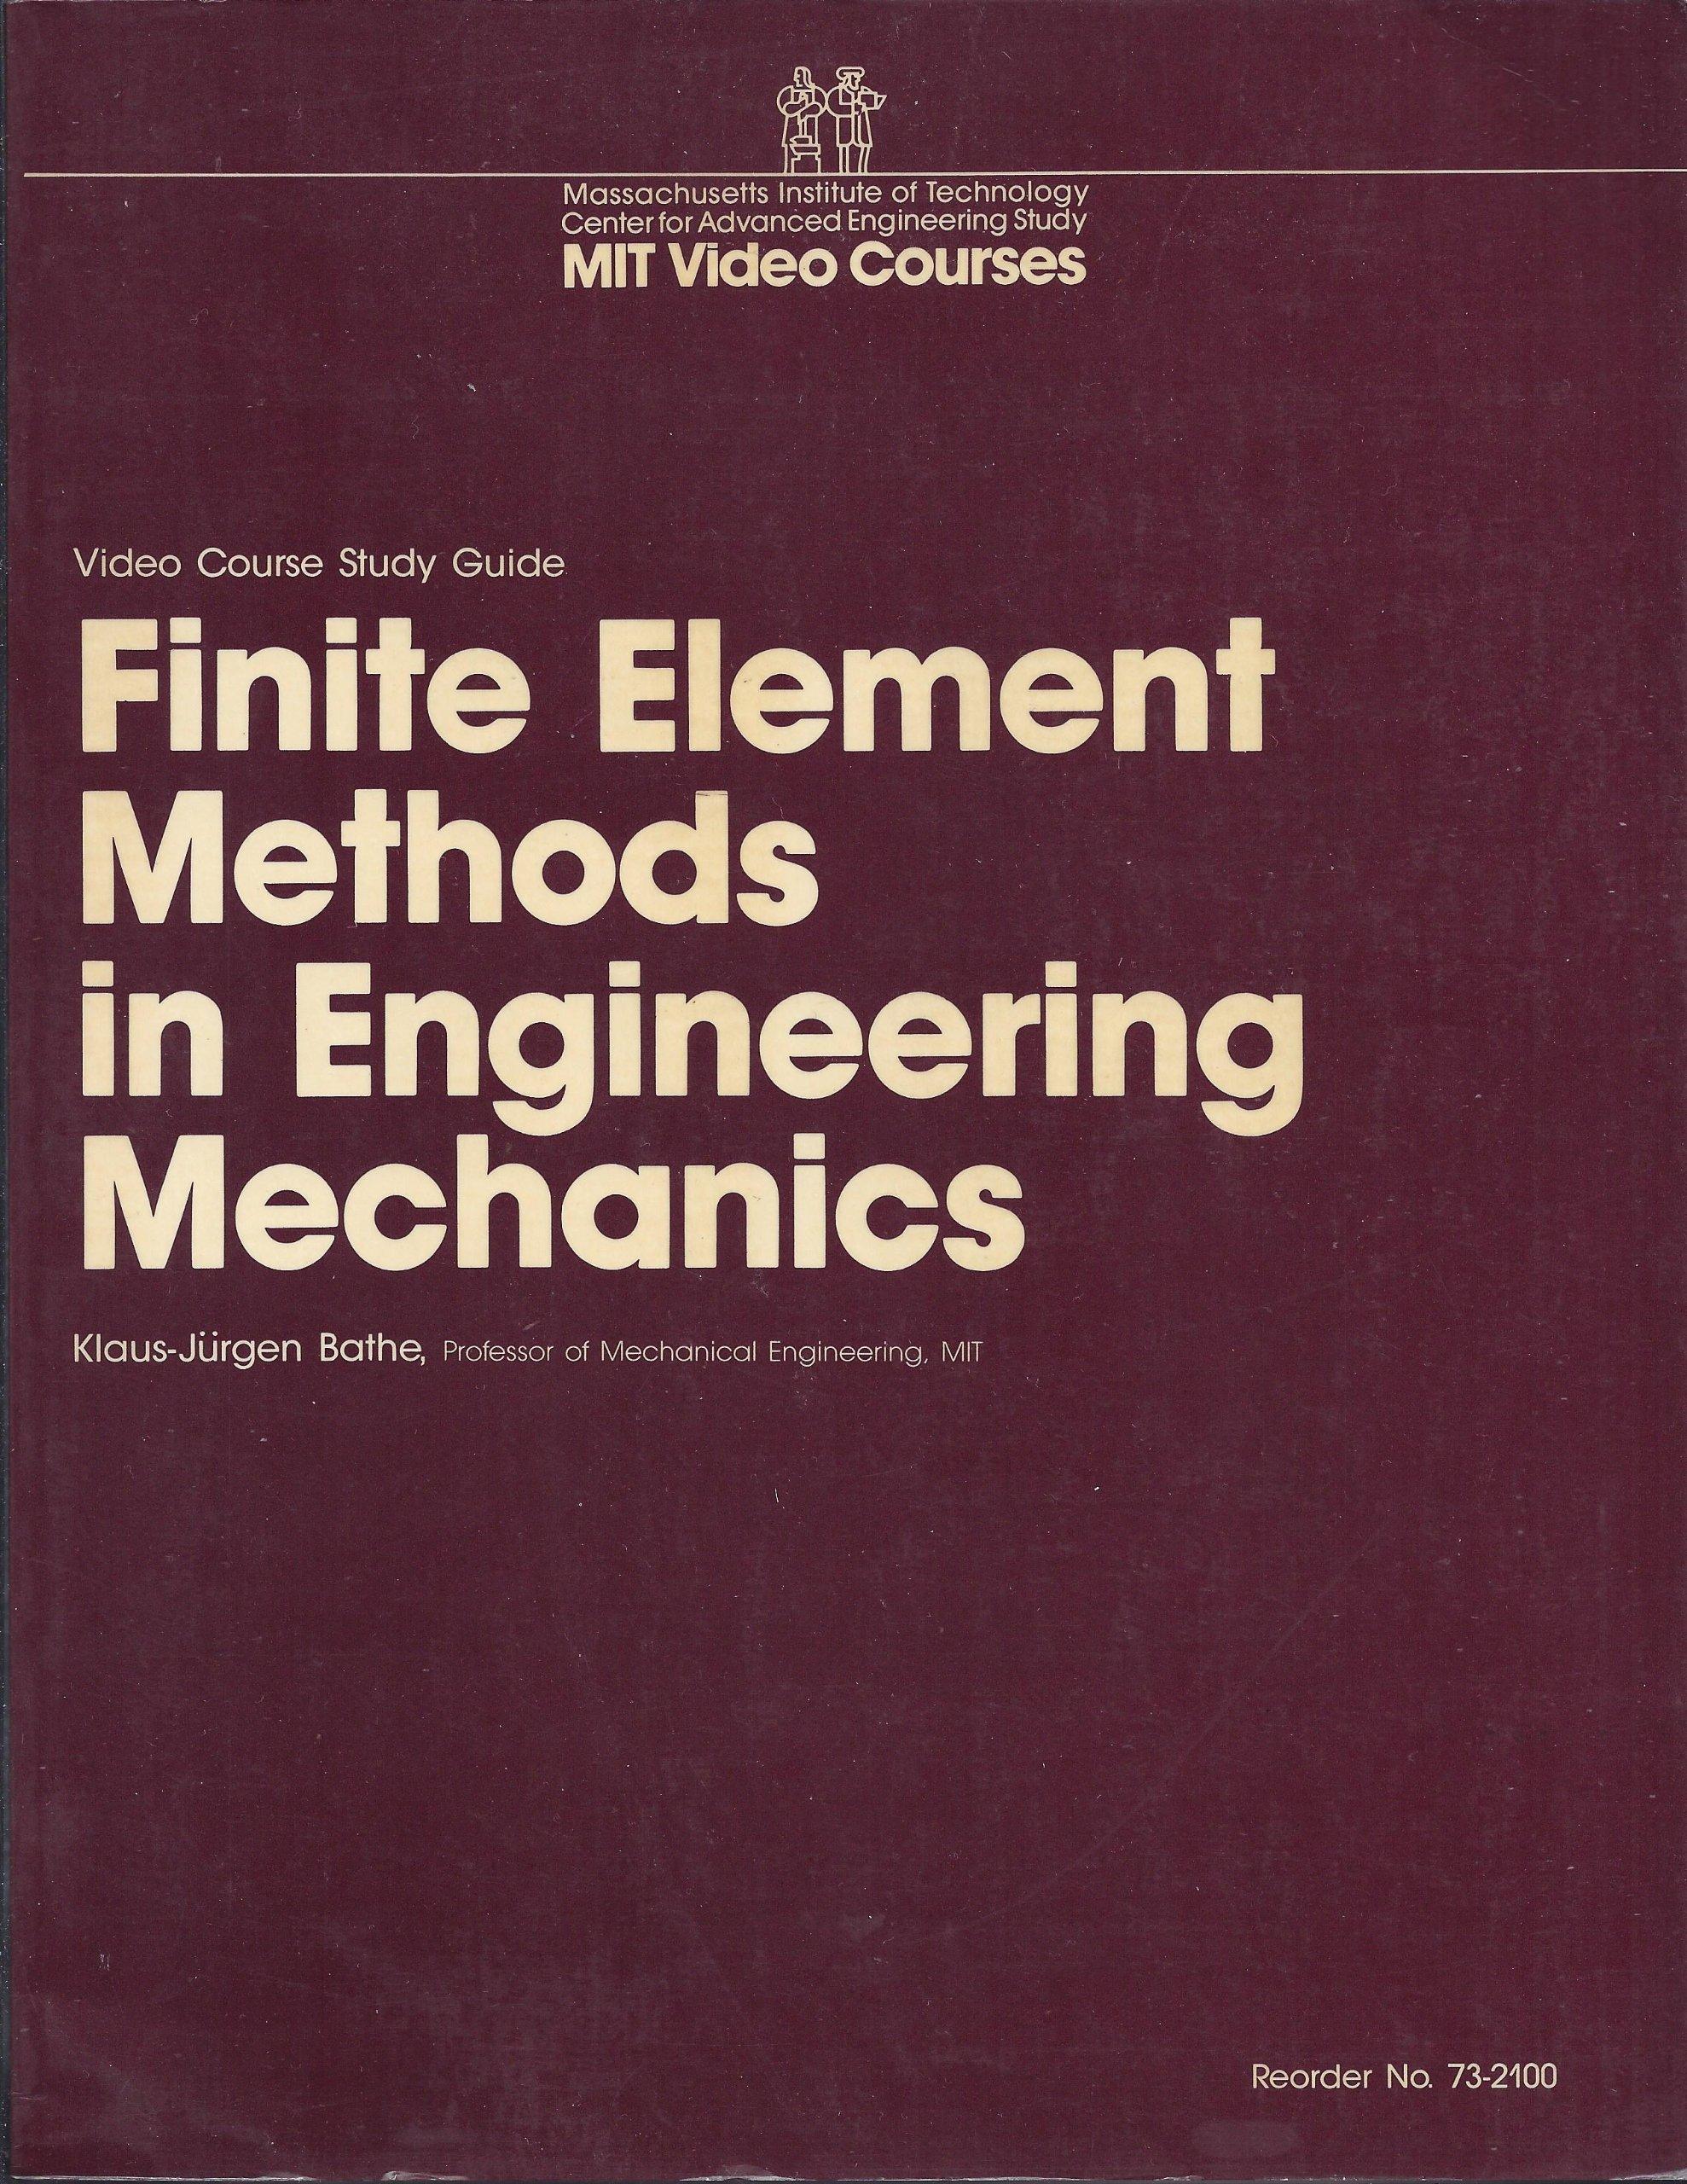 Finite Element Methods in Engineering Mechanics: Video